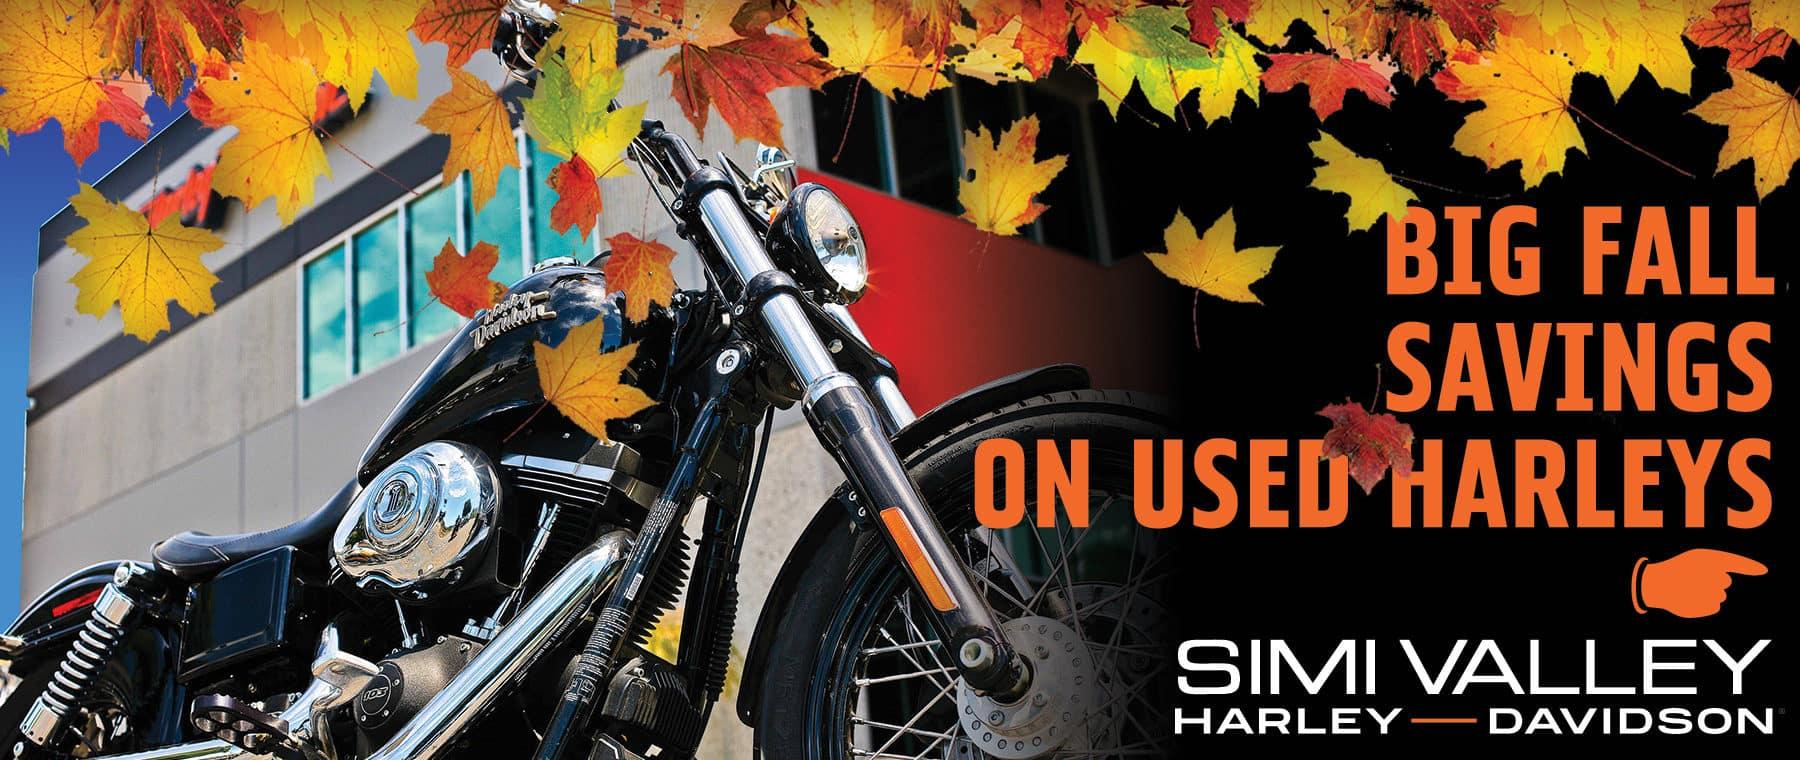 Fall-saving-on-used-harleys1